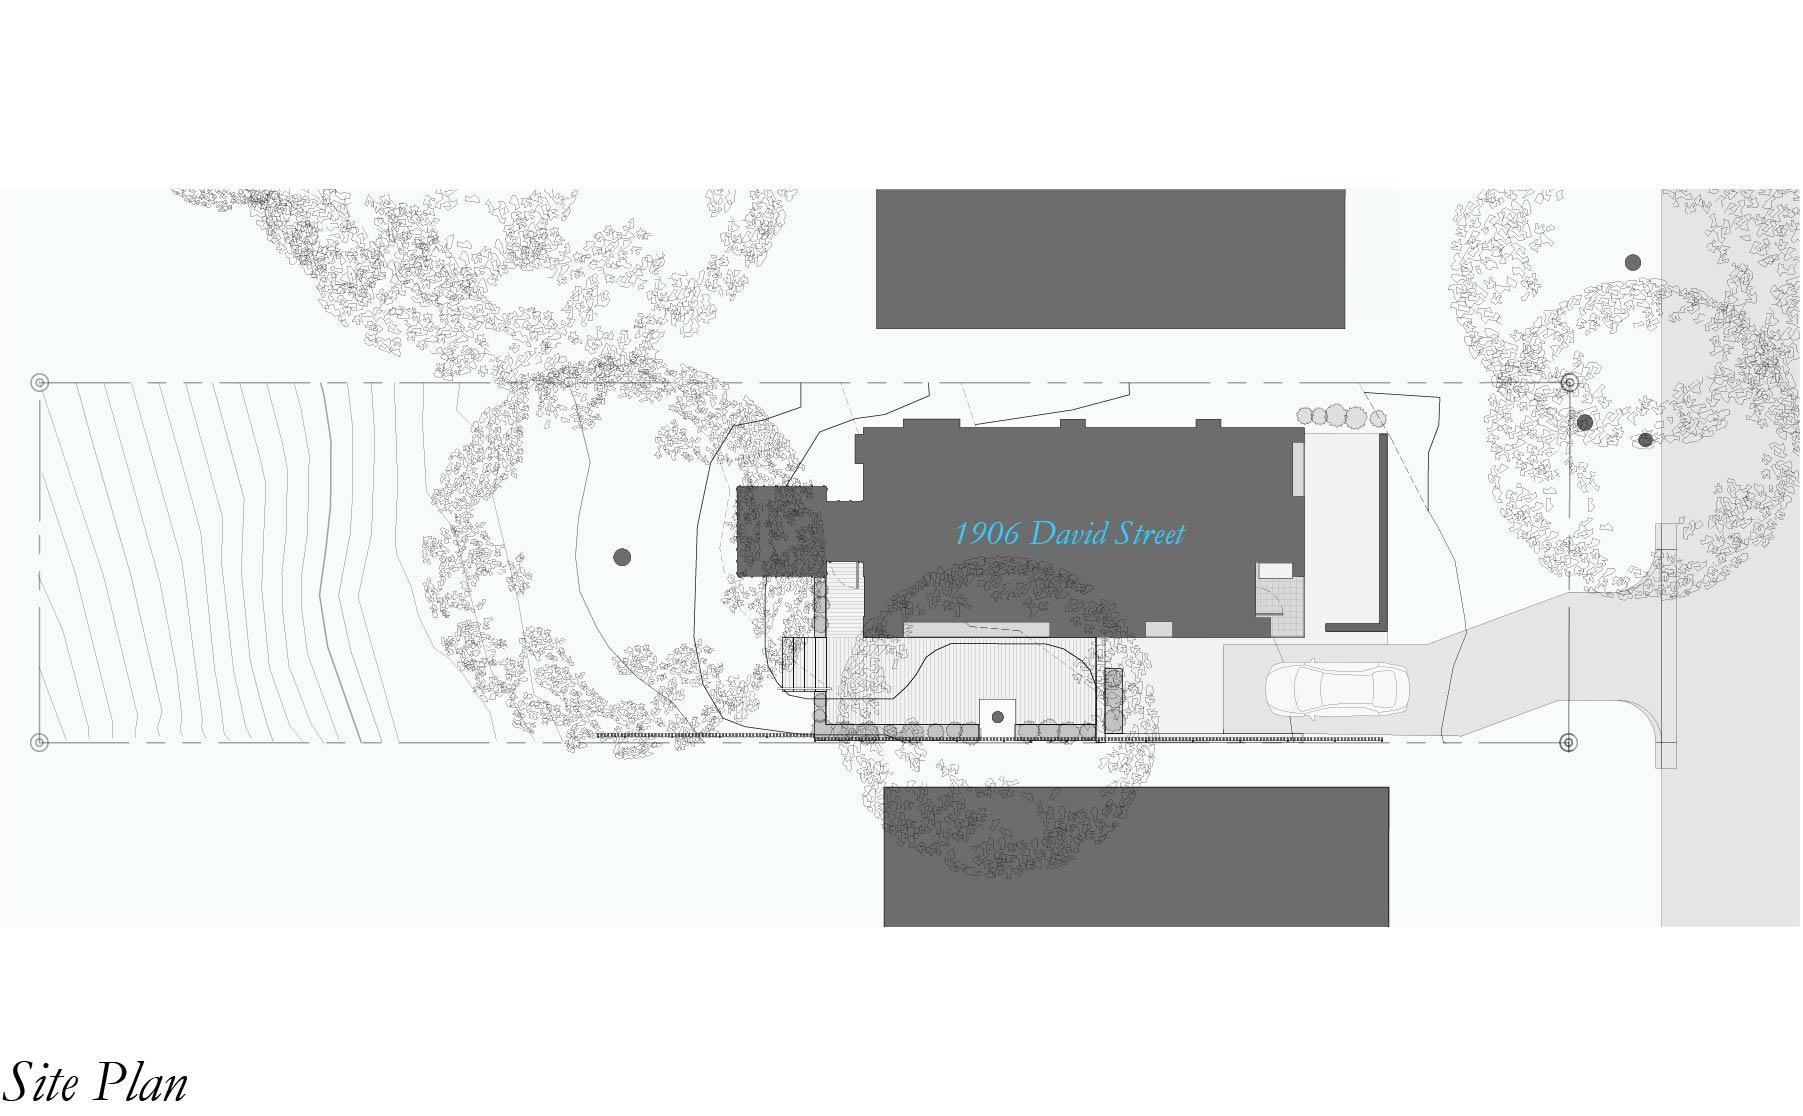 036_DS_Plan site.jpg